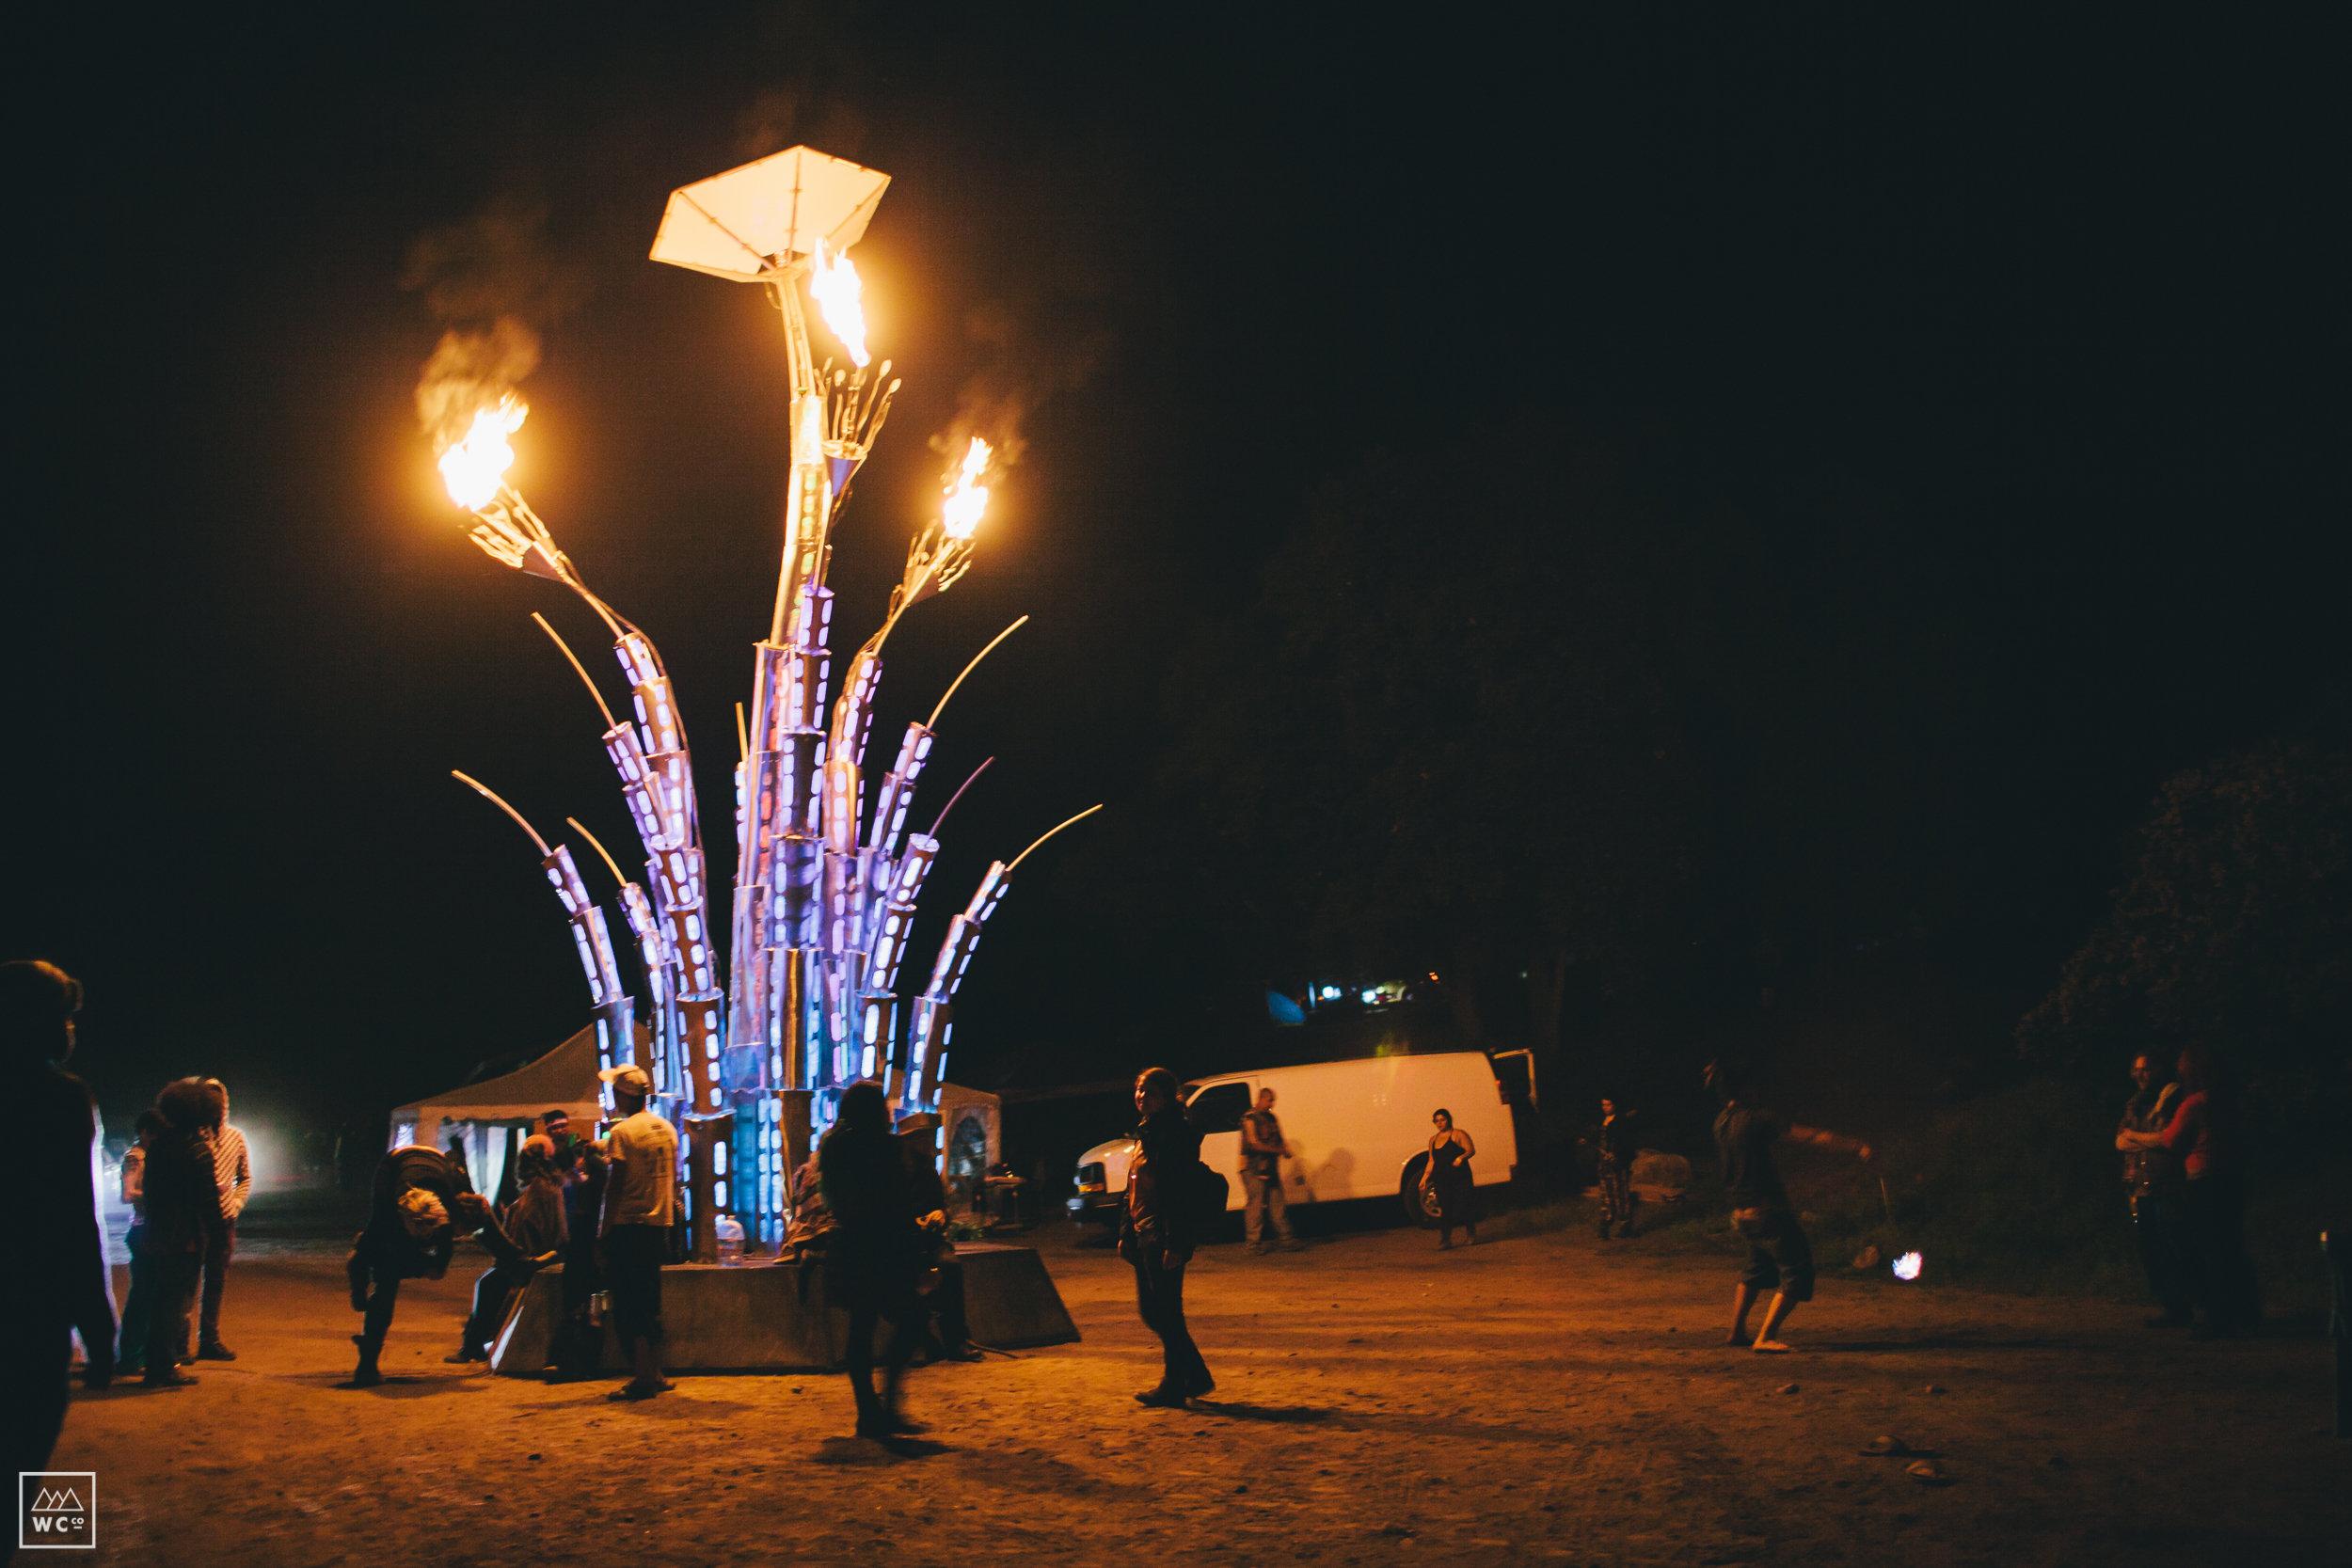 View More: http://wintercreative.pass.us/serenity-gathering-2015